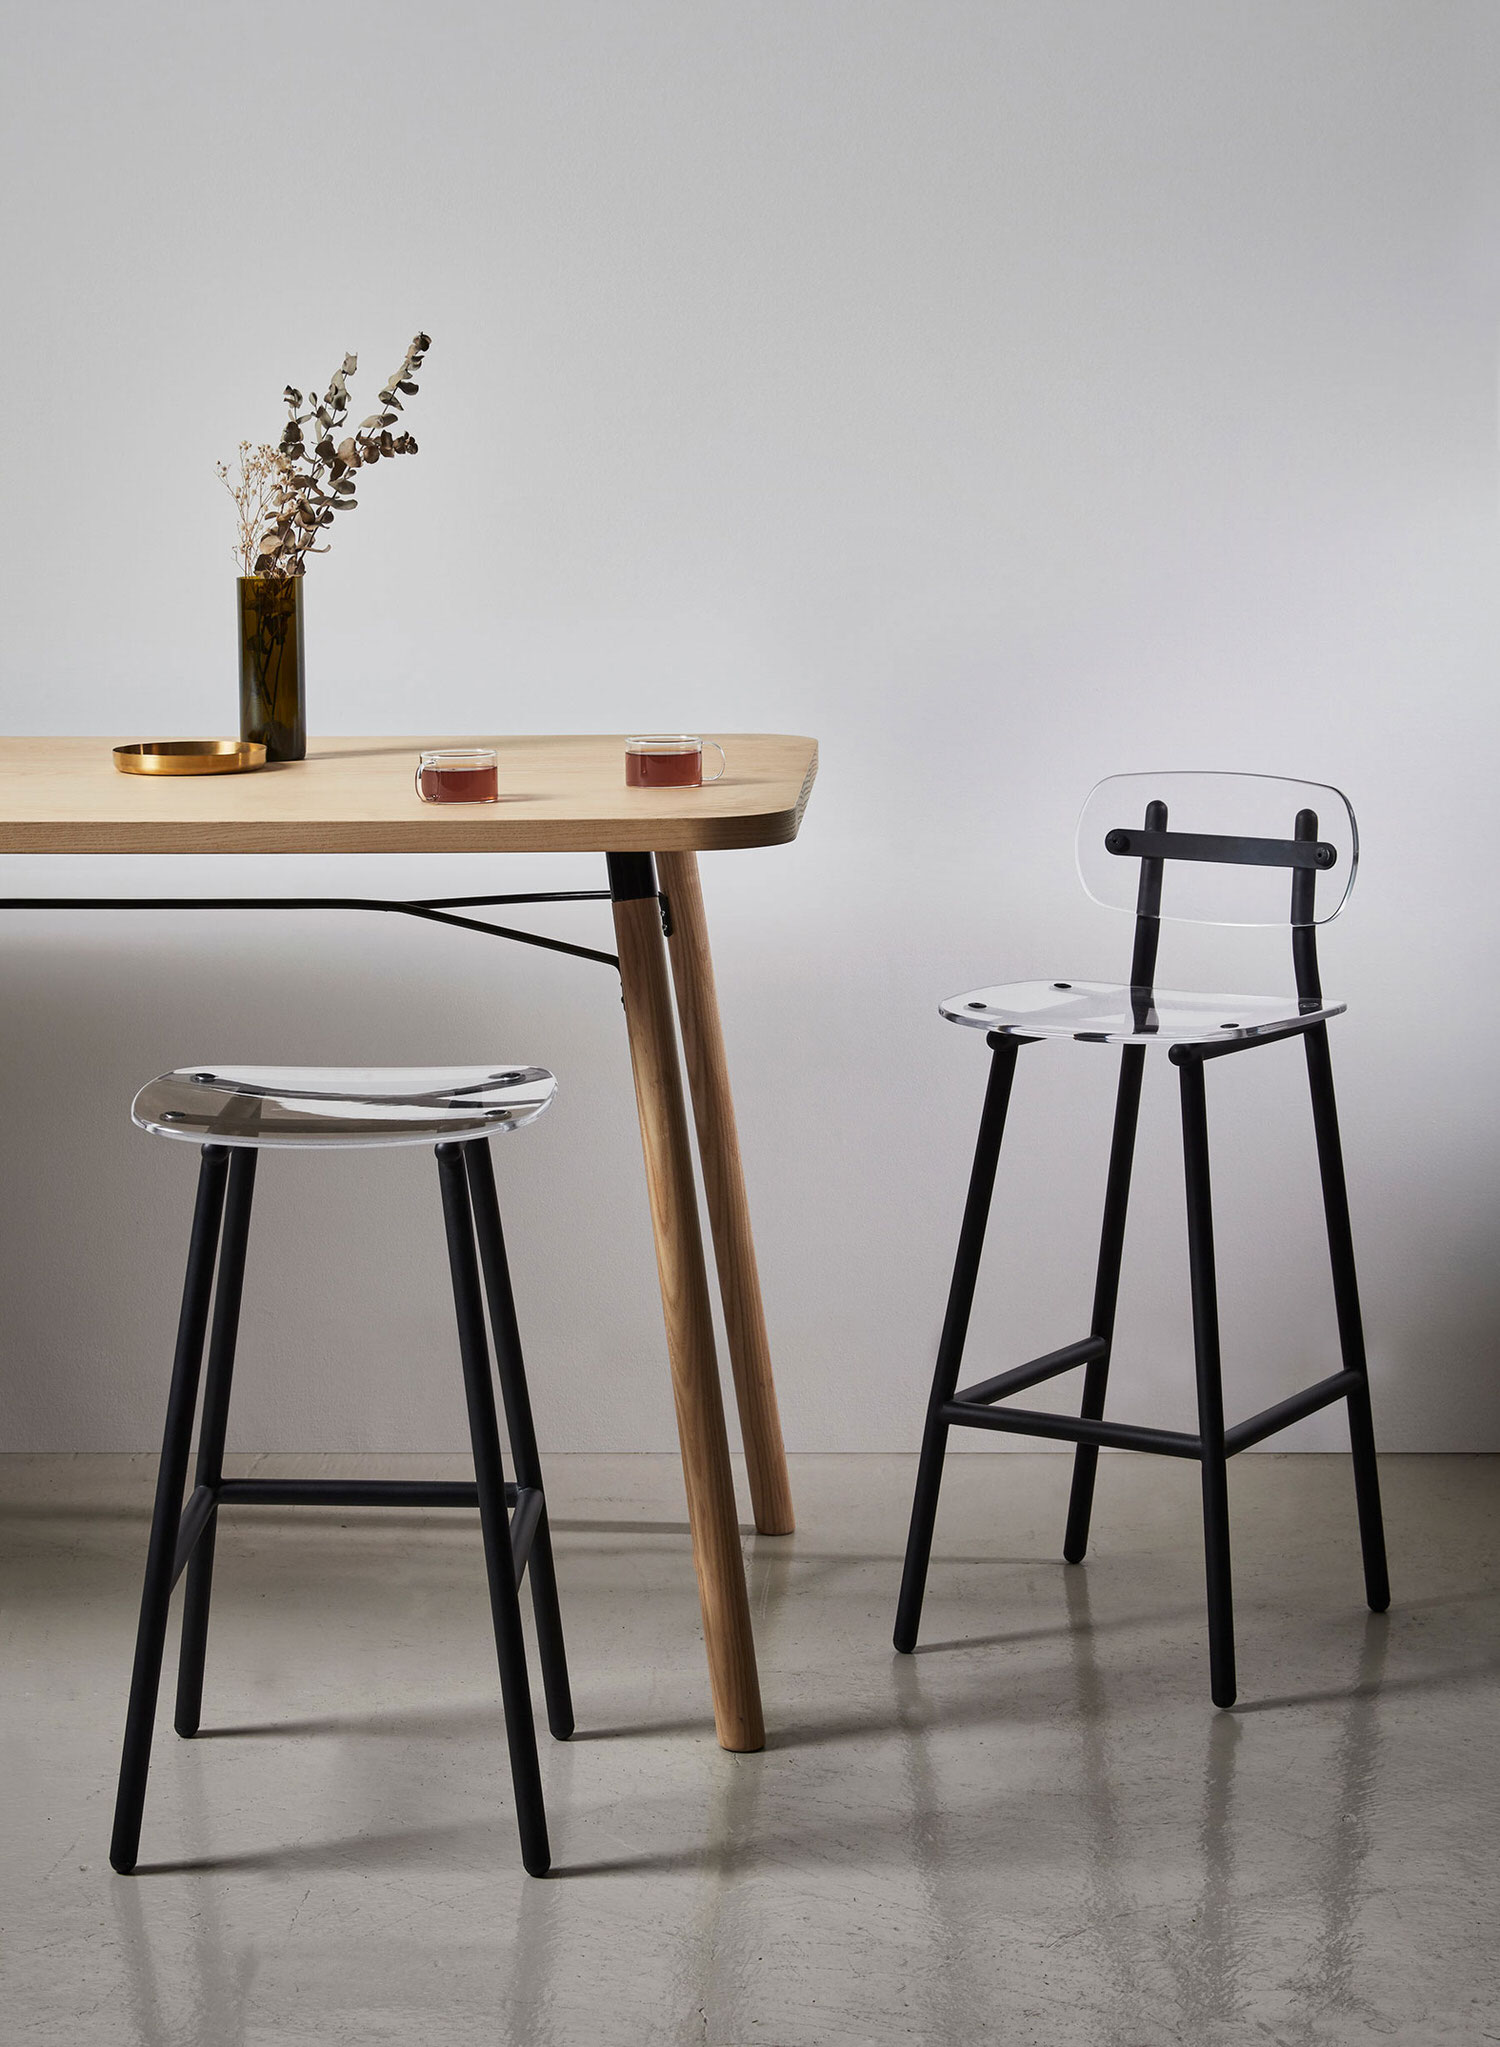 DesignByThem Fenster Bar Stool, Partridge Bar Table, Australian Design   Yellowtrace